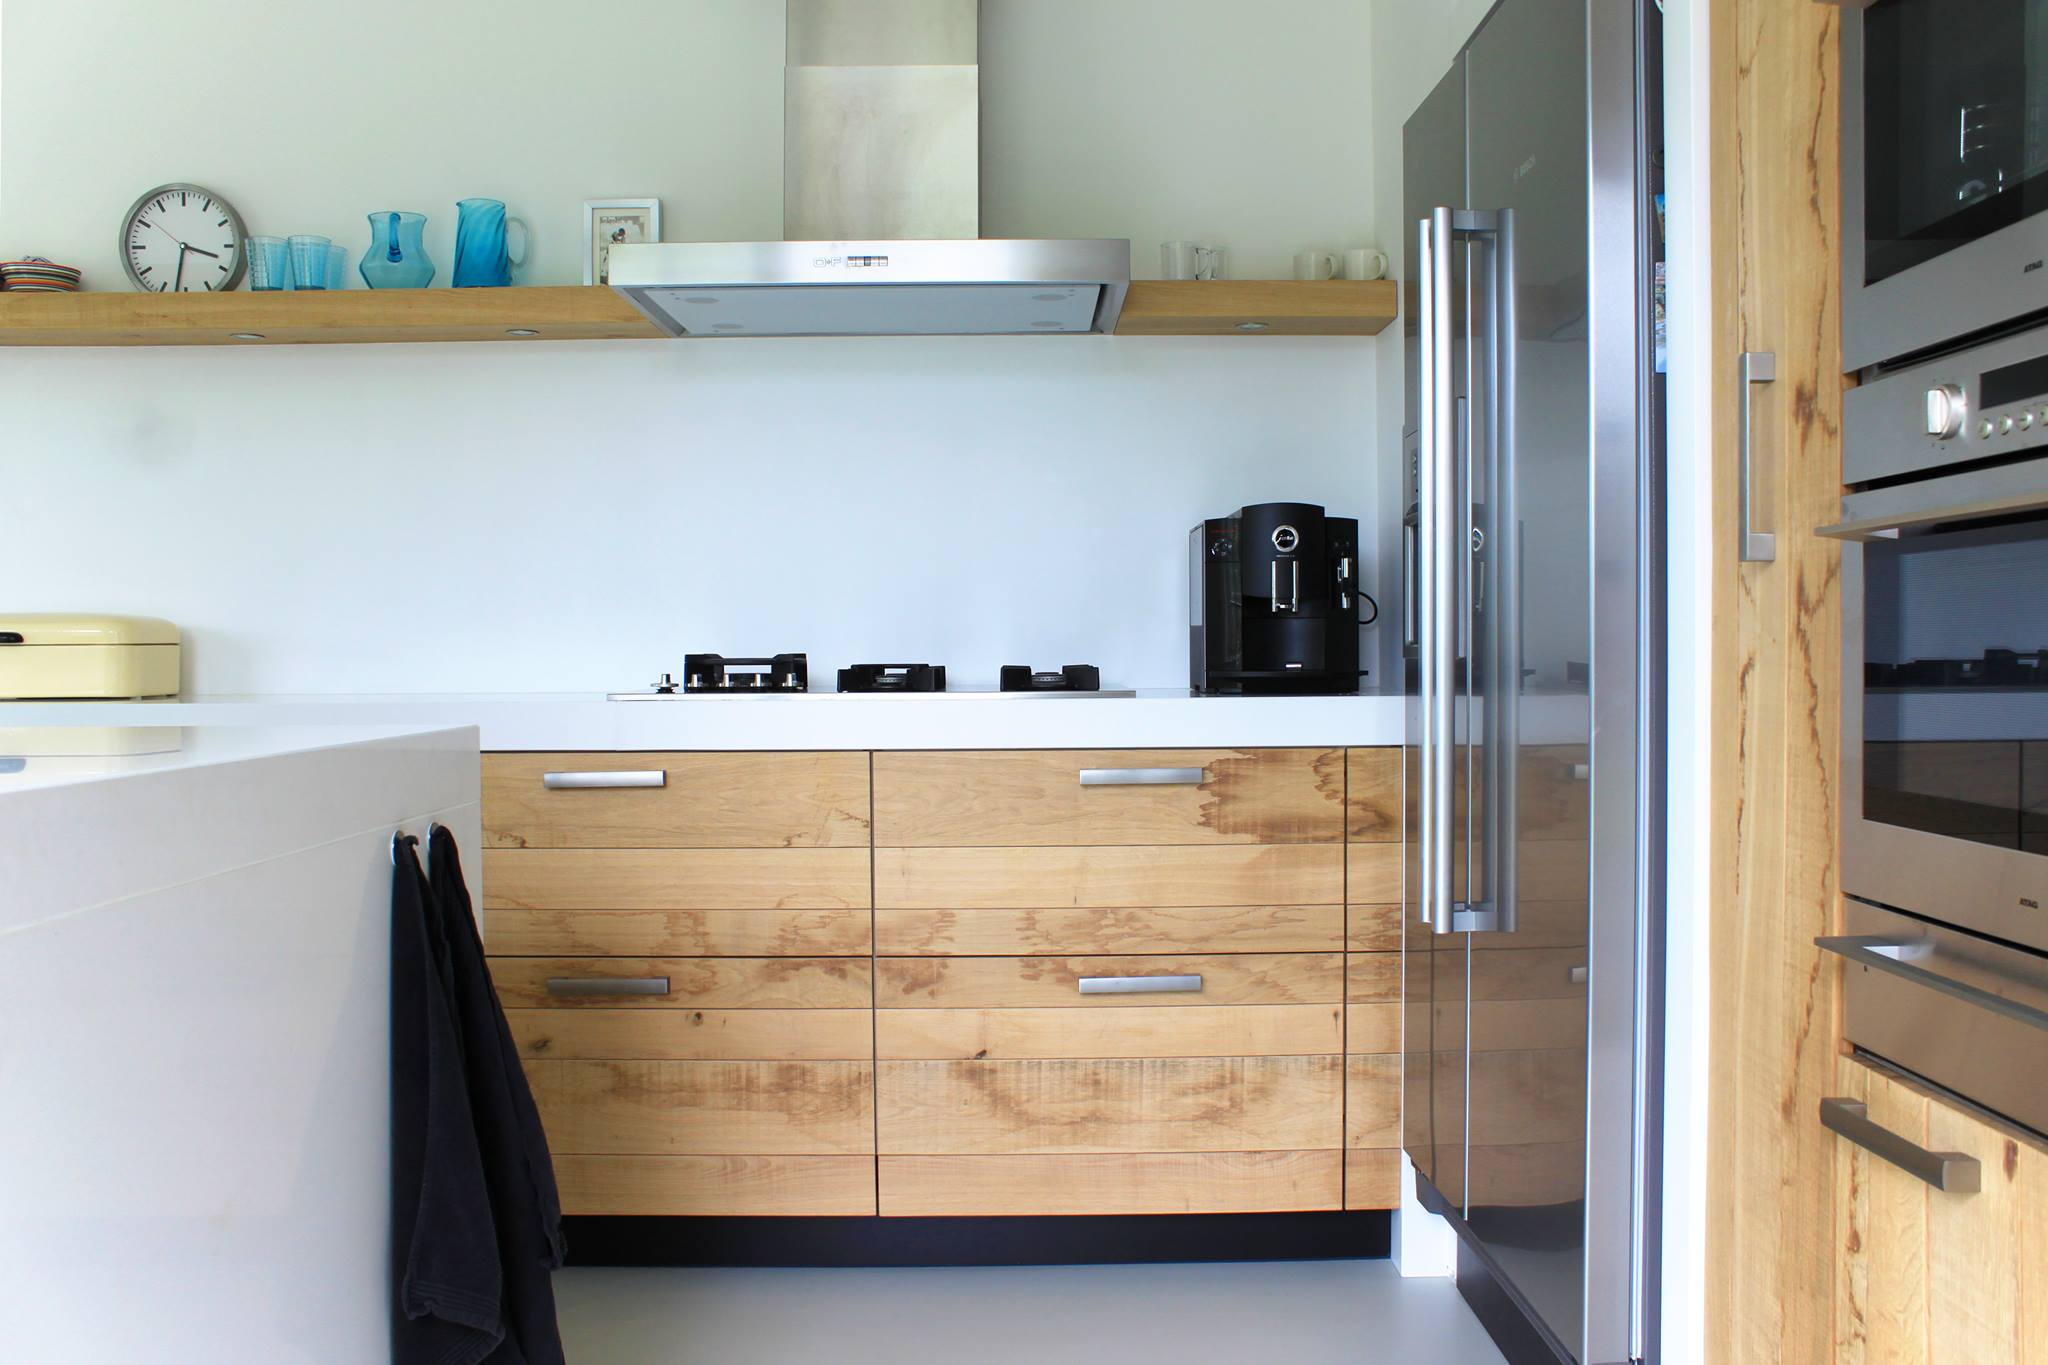 Eiken Keuken Achterwand : Moderne ruw eiken houten keukens met wit keukenblad